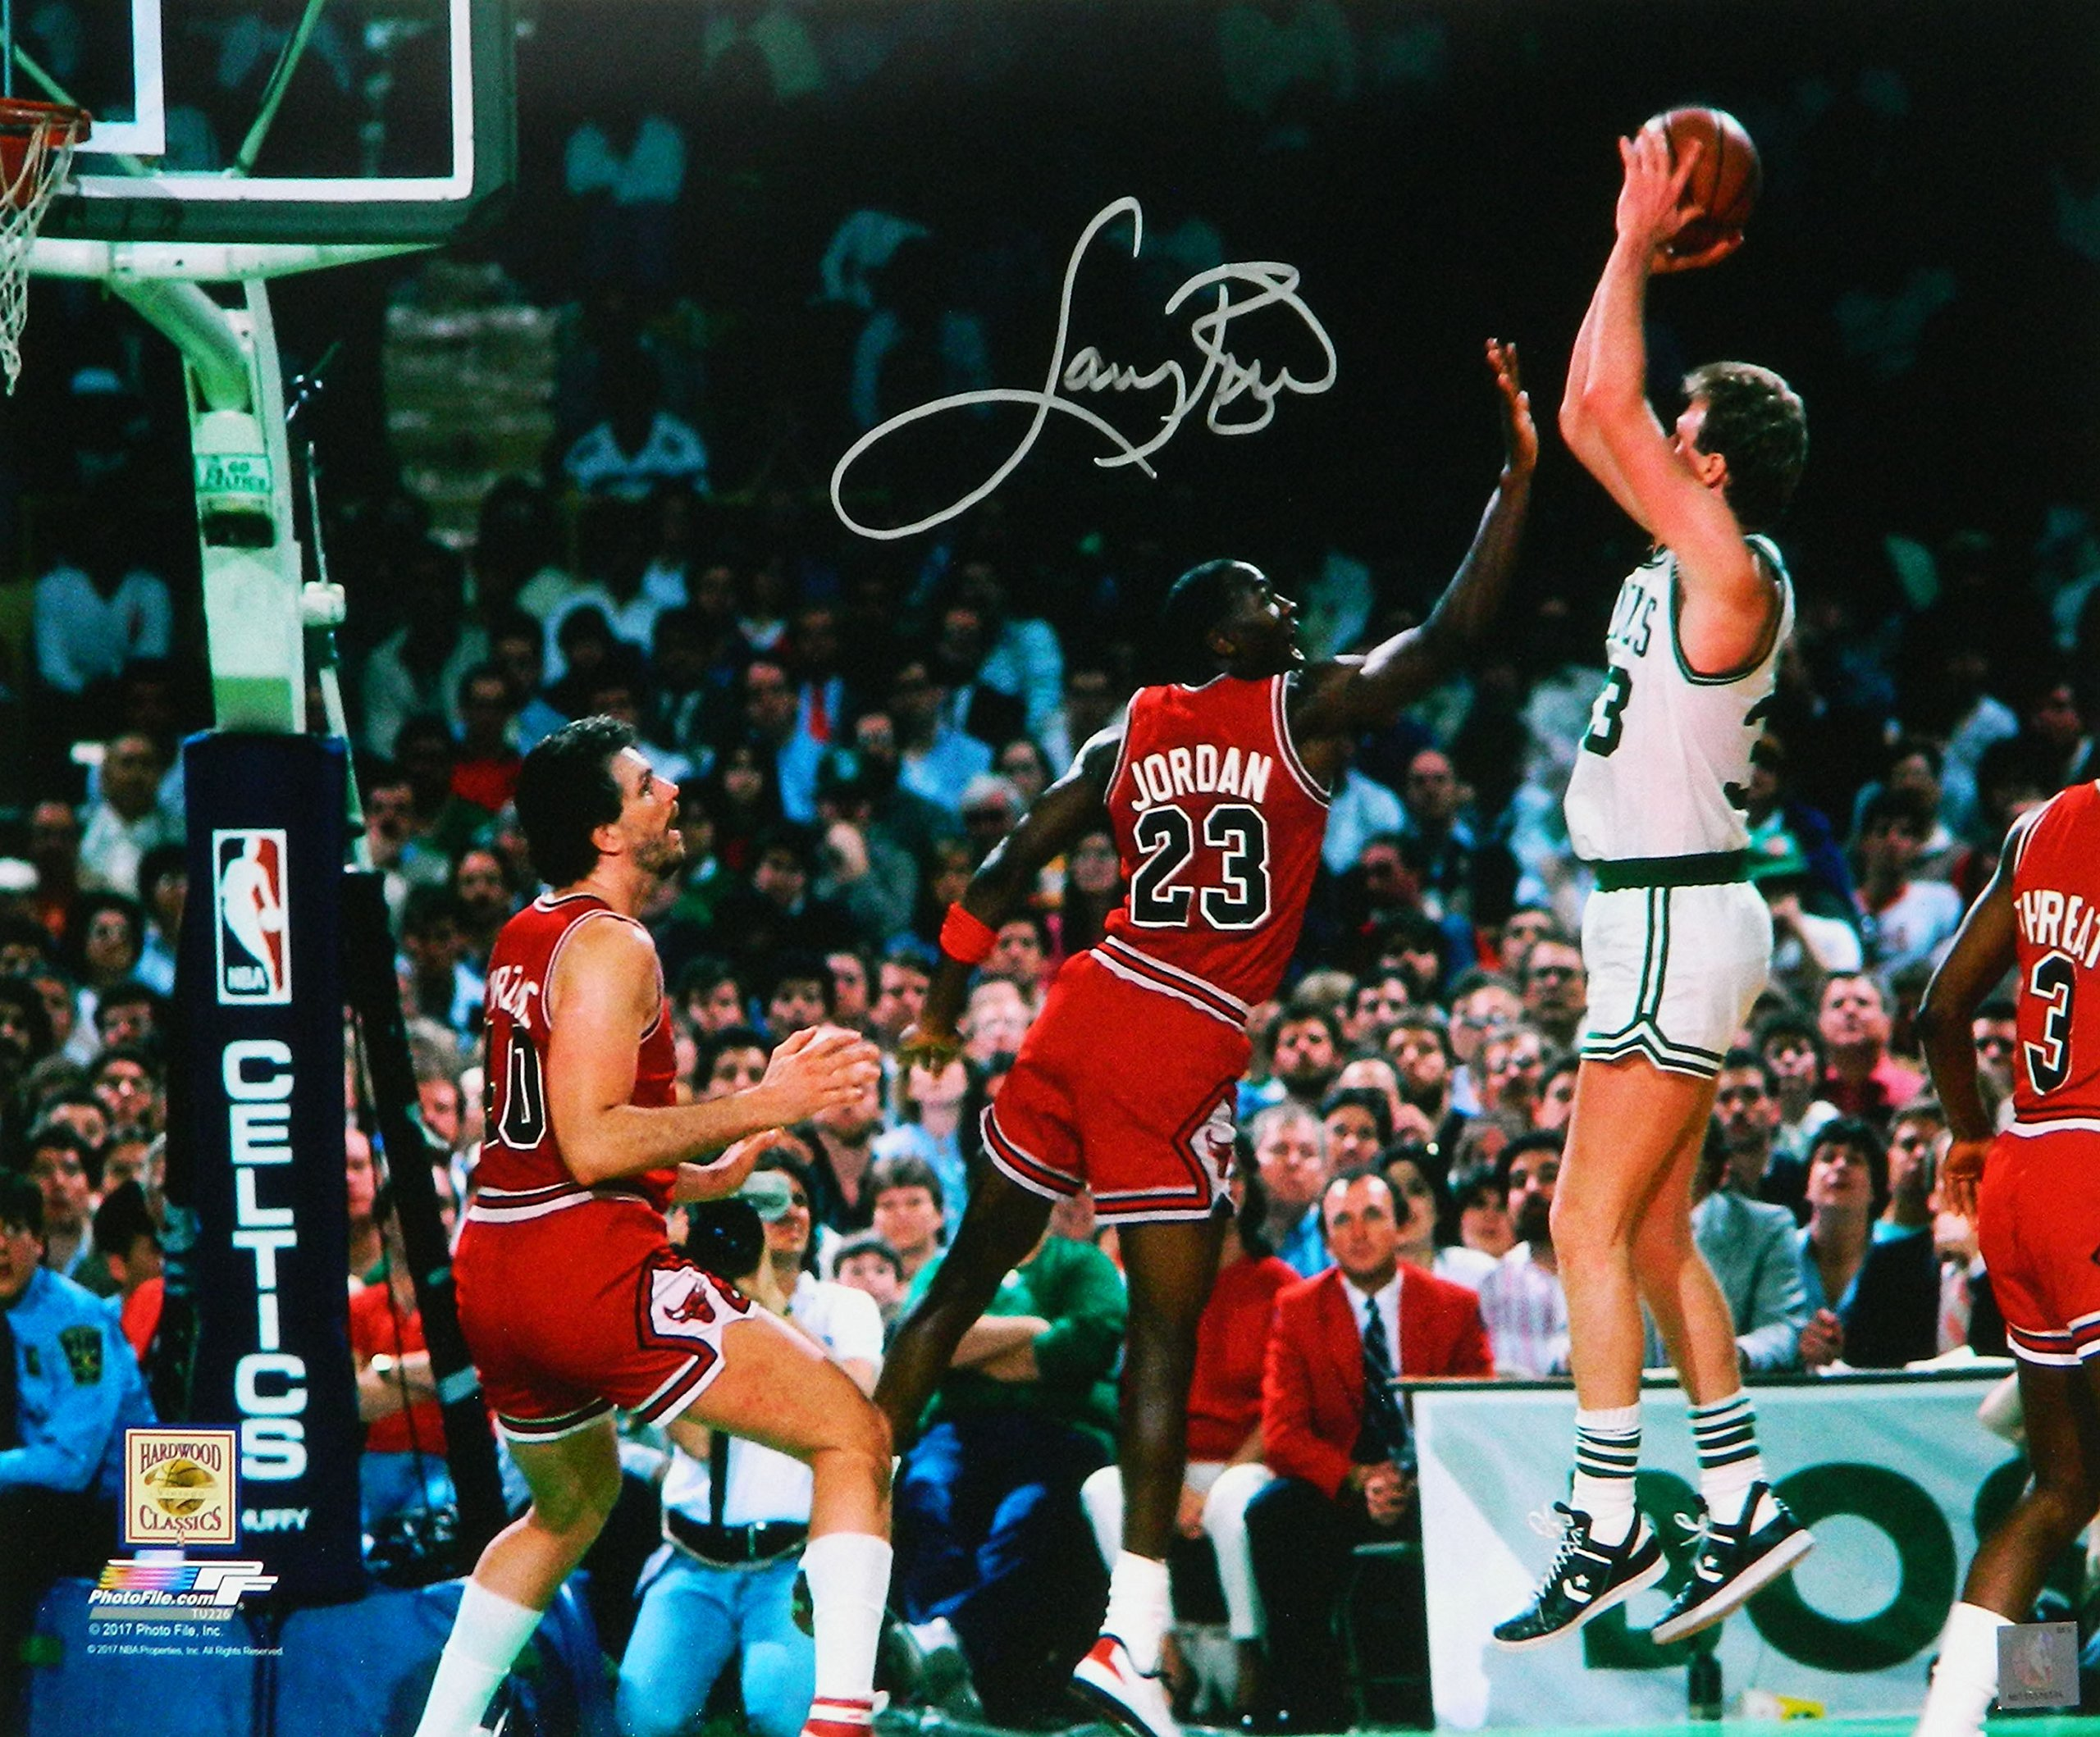 Larry Bird Signed Boston Celtics Shooting Over Michael Jordan 16x20 Photo